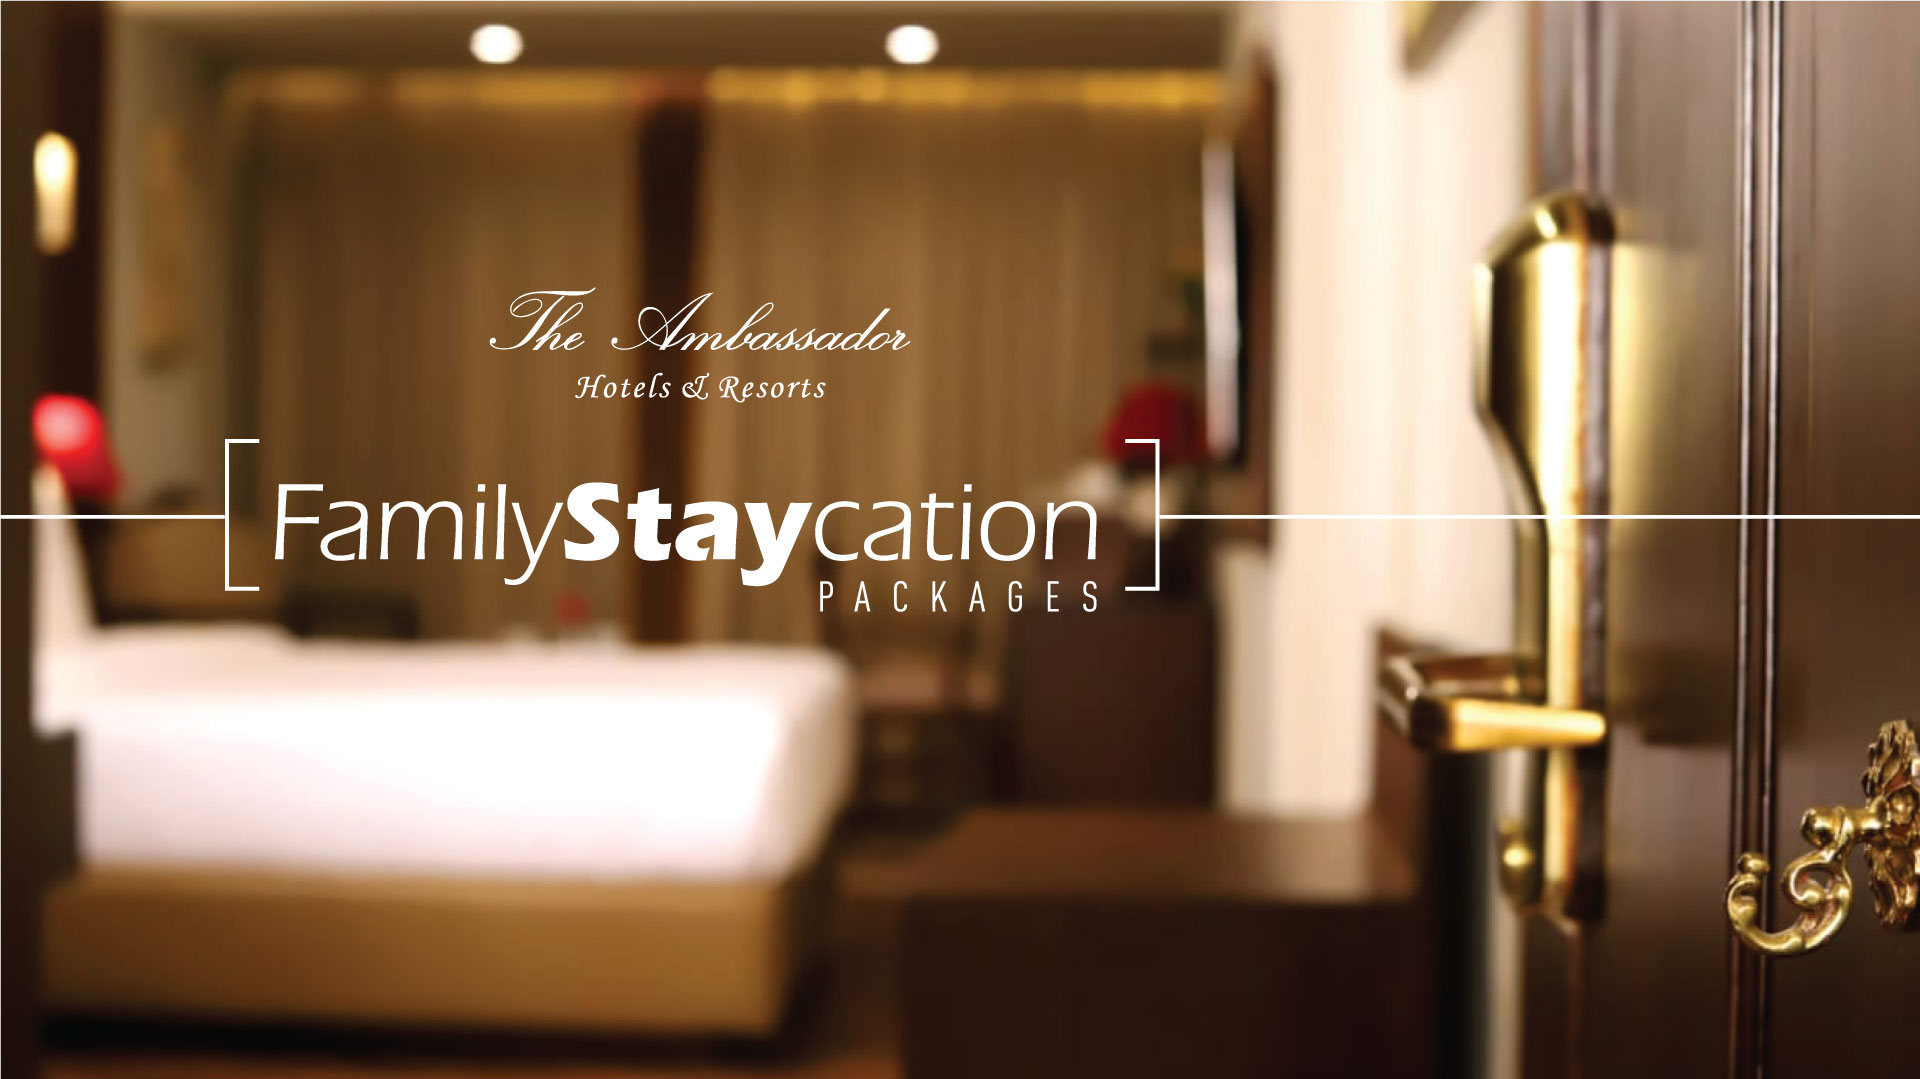 Staycation Creative copy 01 - The Ambassador | Heritage Hotels in Mumbai, Aurangabad, Chennai - Drivecation - Staycation Package